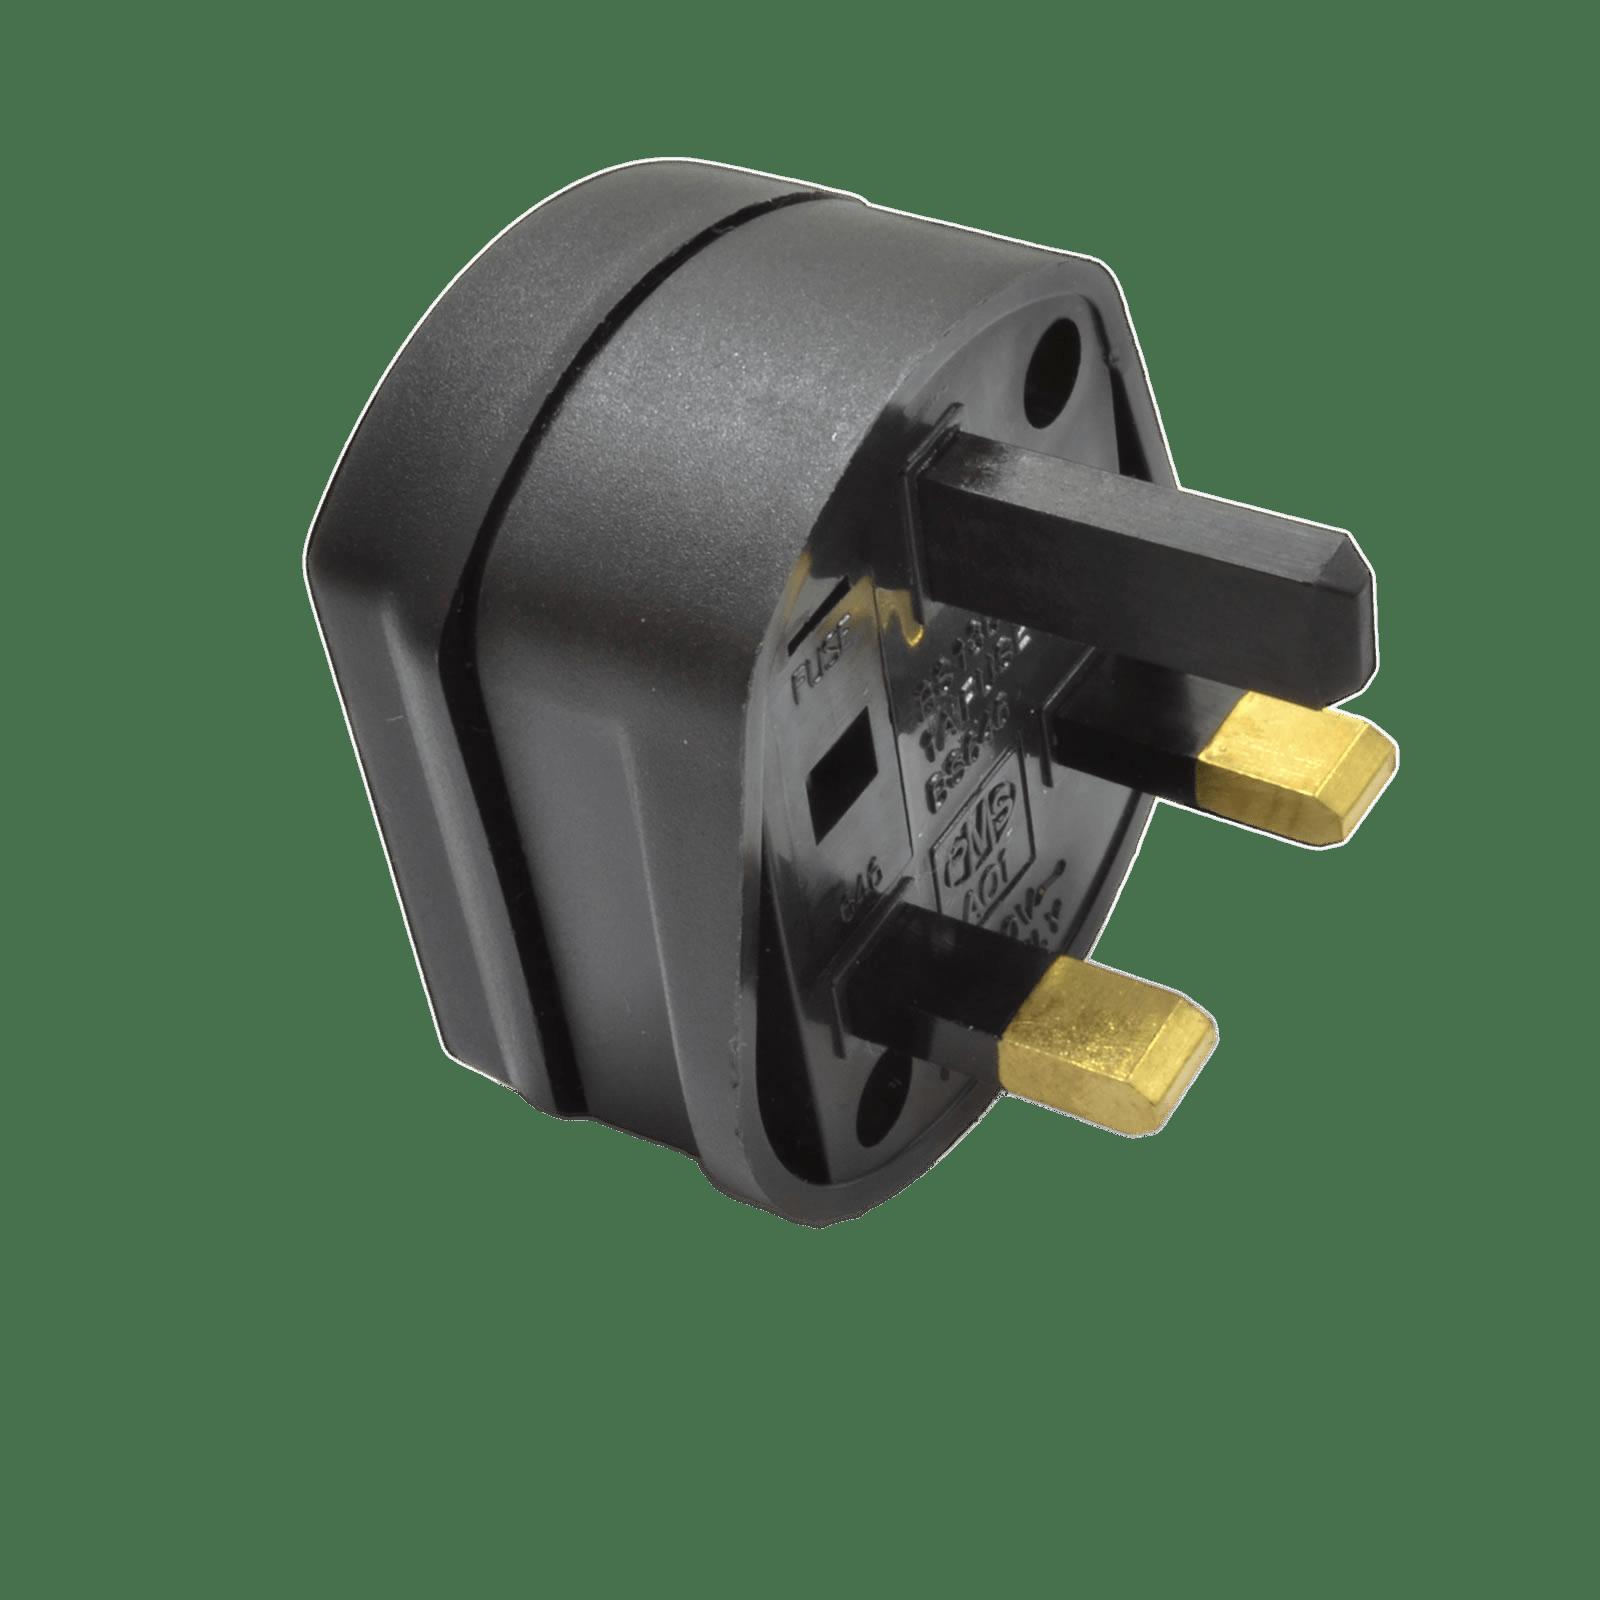 Uk black transparent png. Plug clipart extension